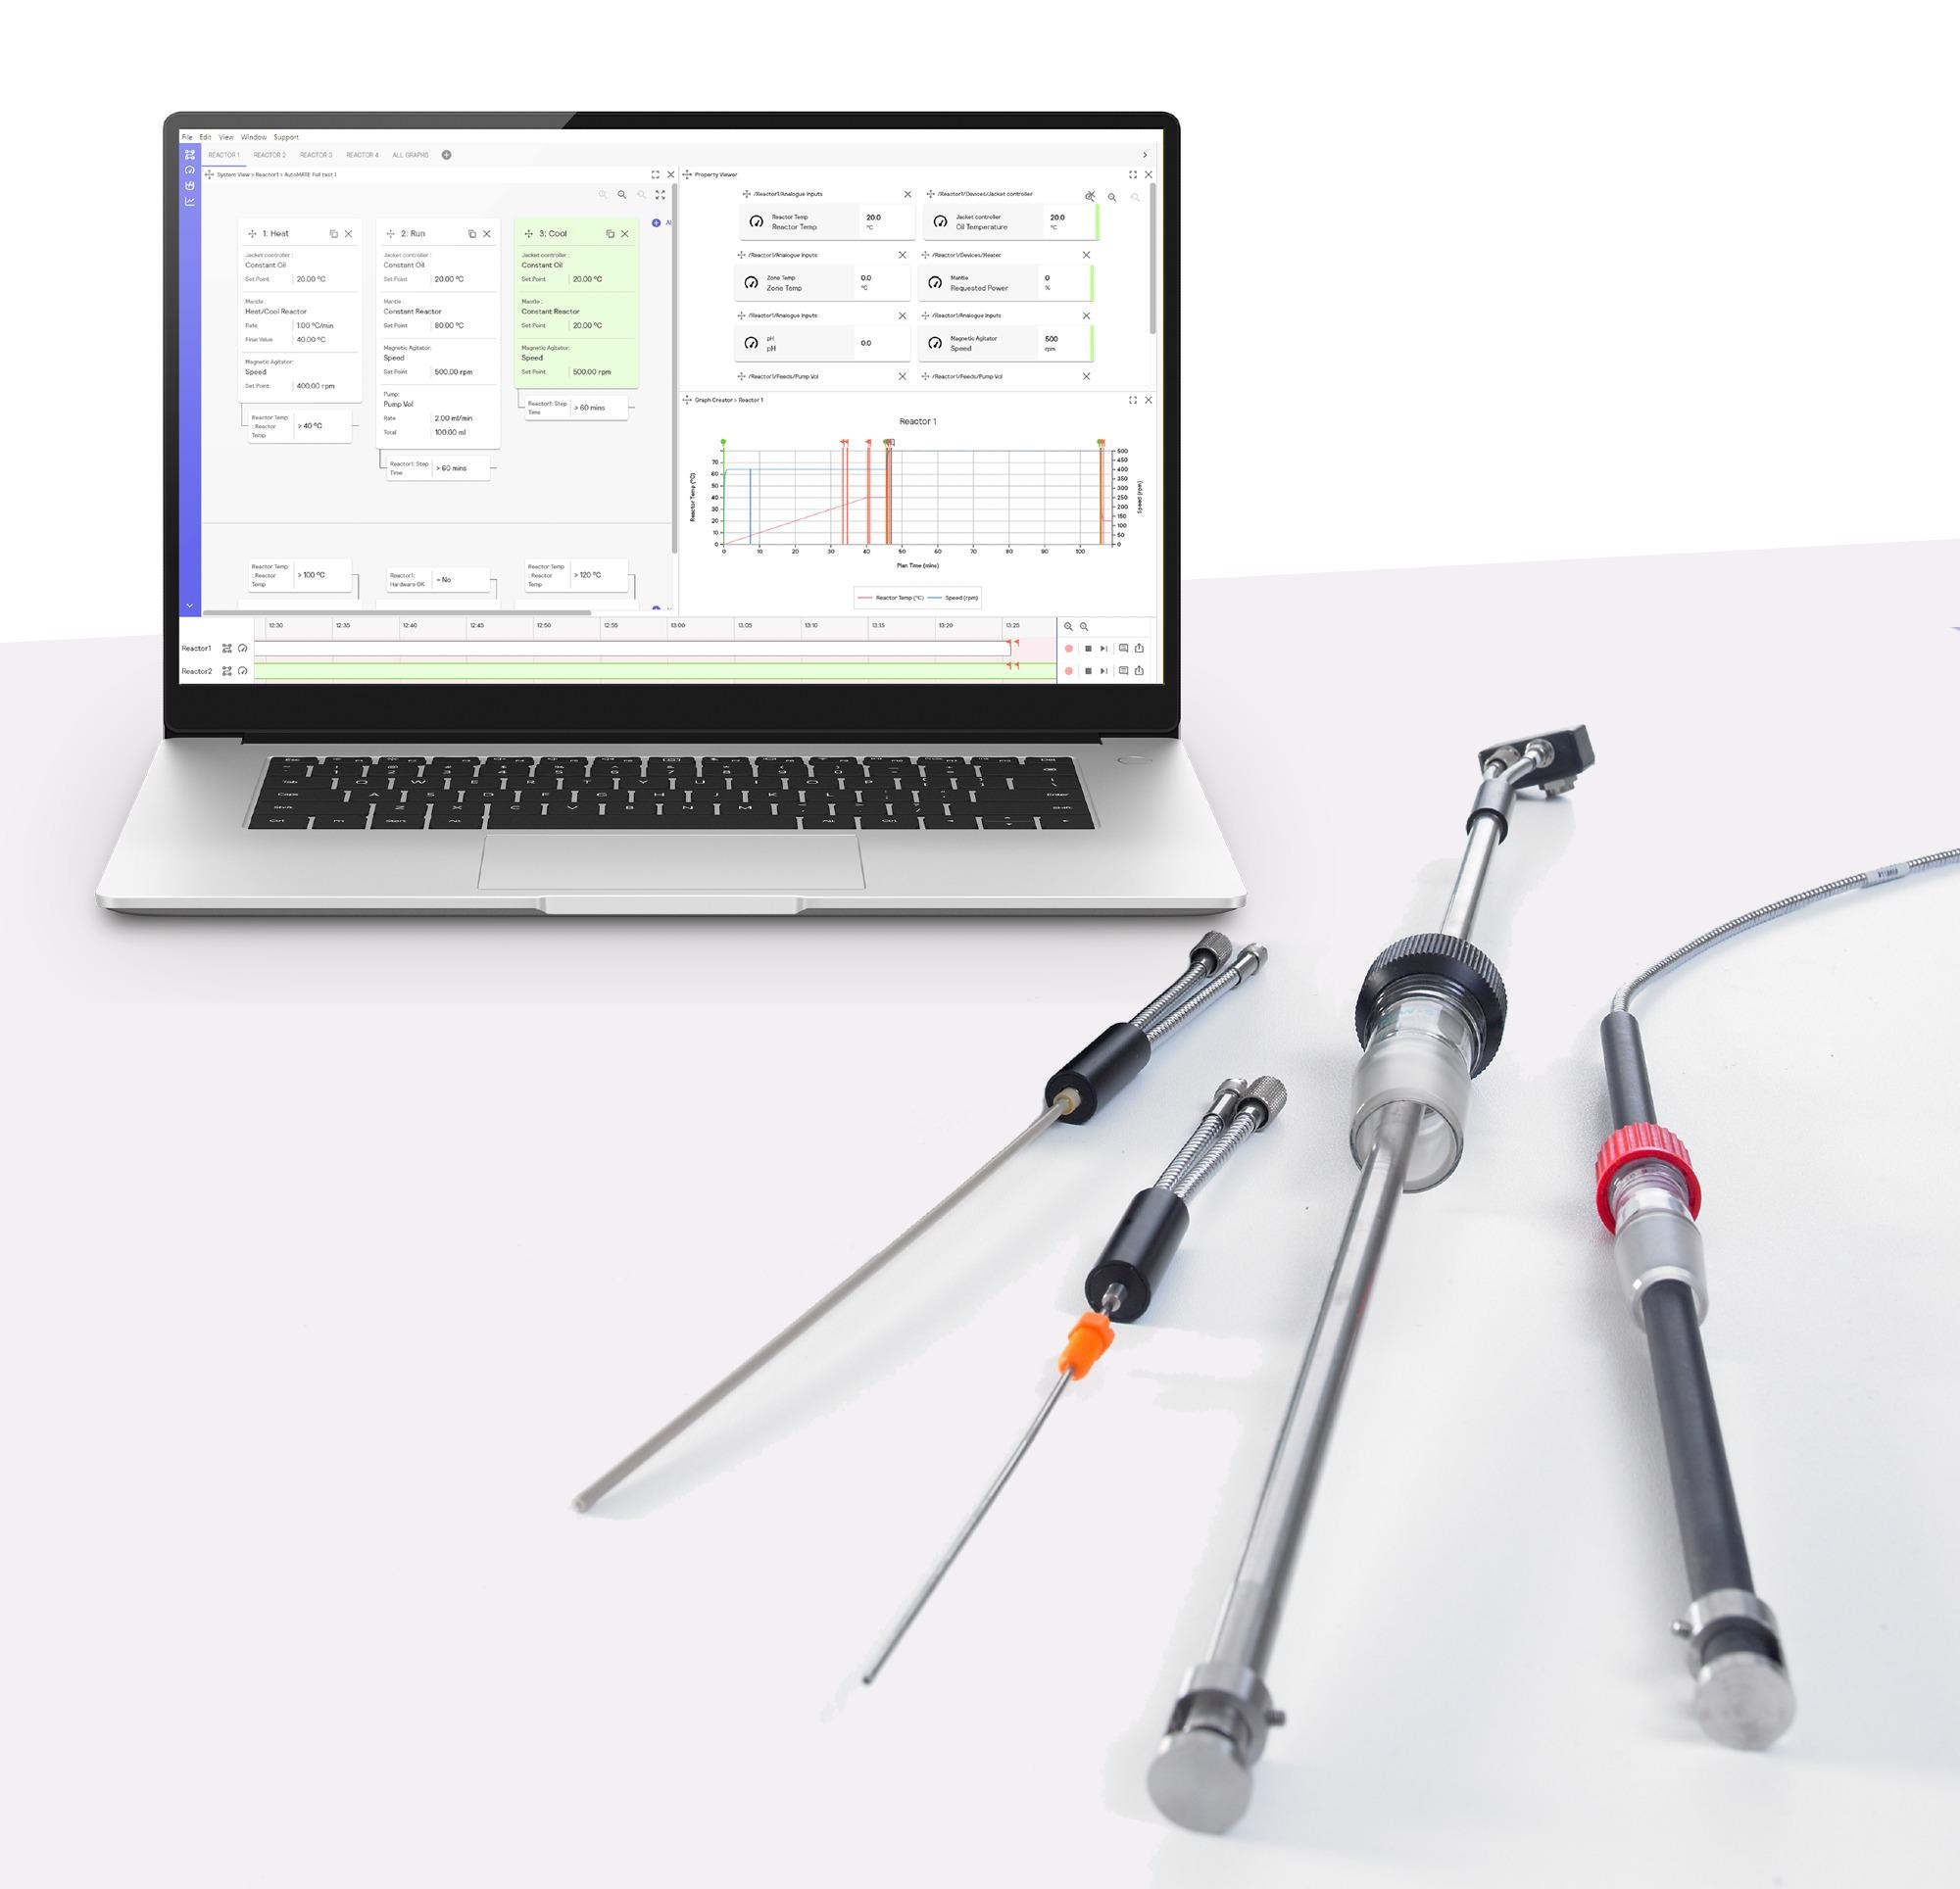 The CrystalEYES: Crystallization Monitoring Sensor